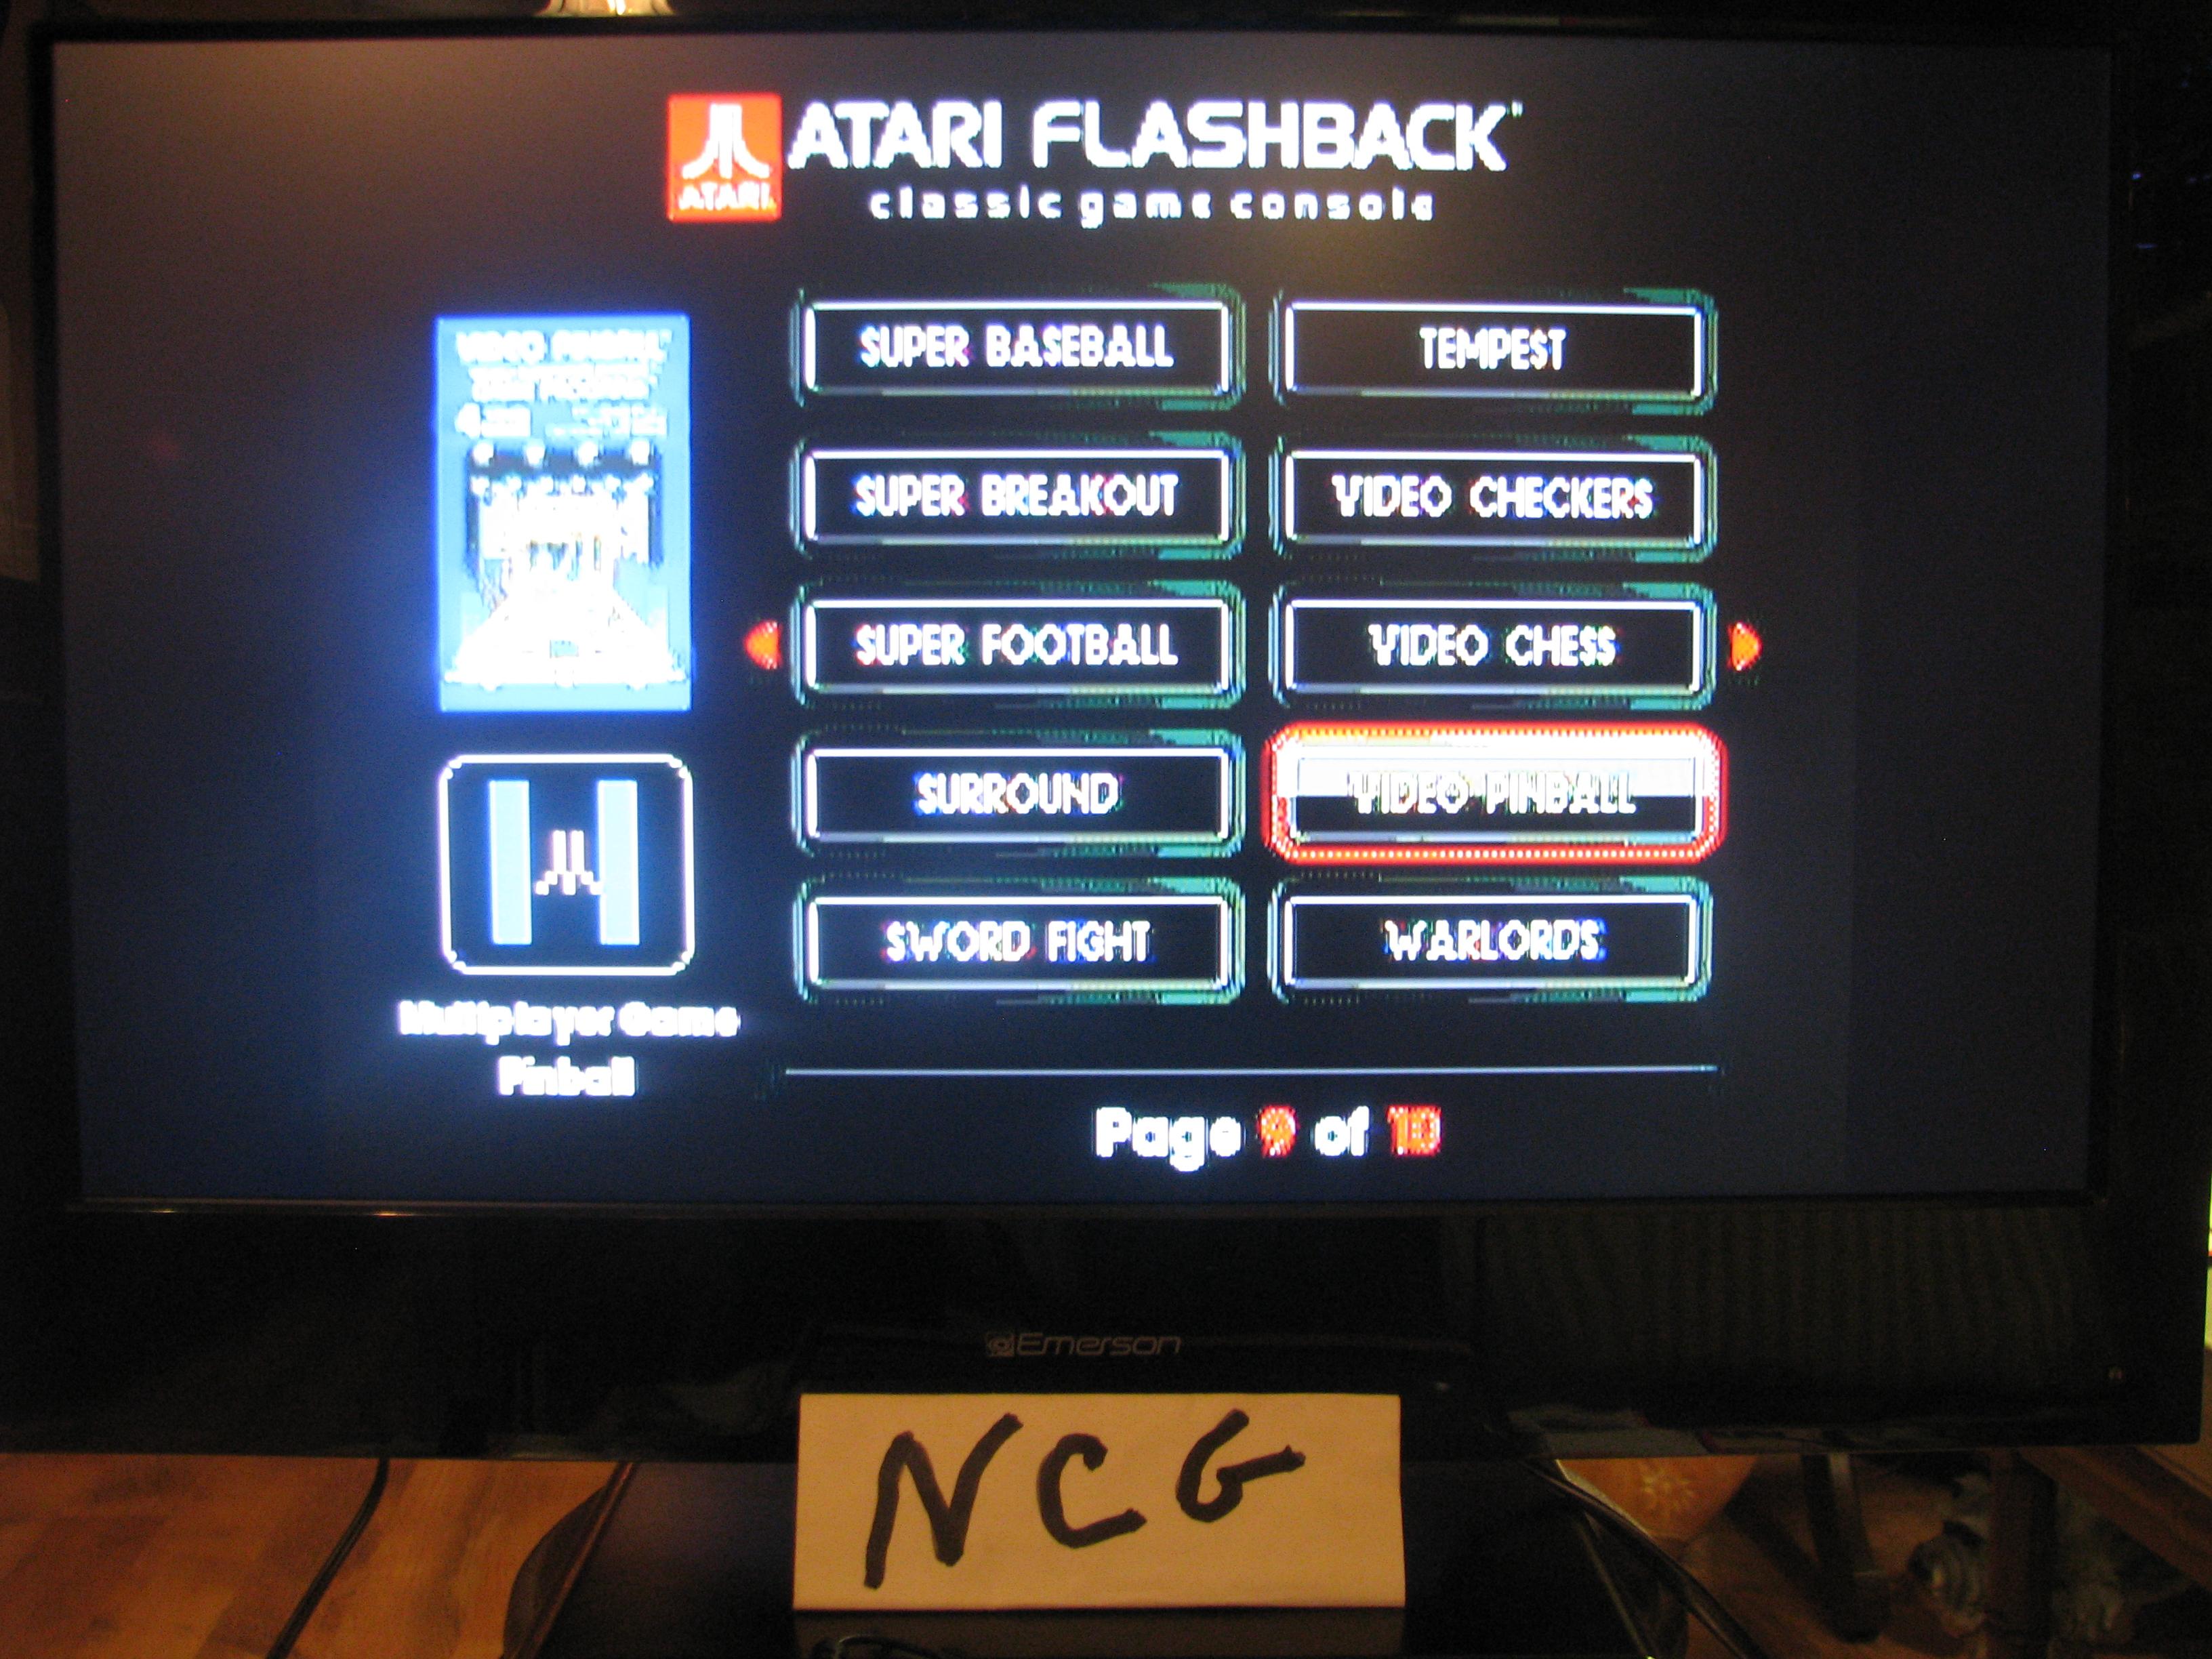 NorthCoastGamer: Video Pinball: Game 1B (Atari Flashback 5) 929,246 points on 2015-01-10 20:34:15